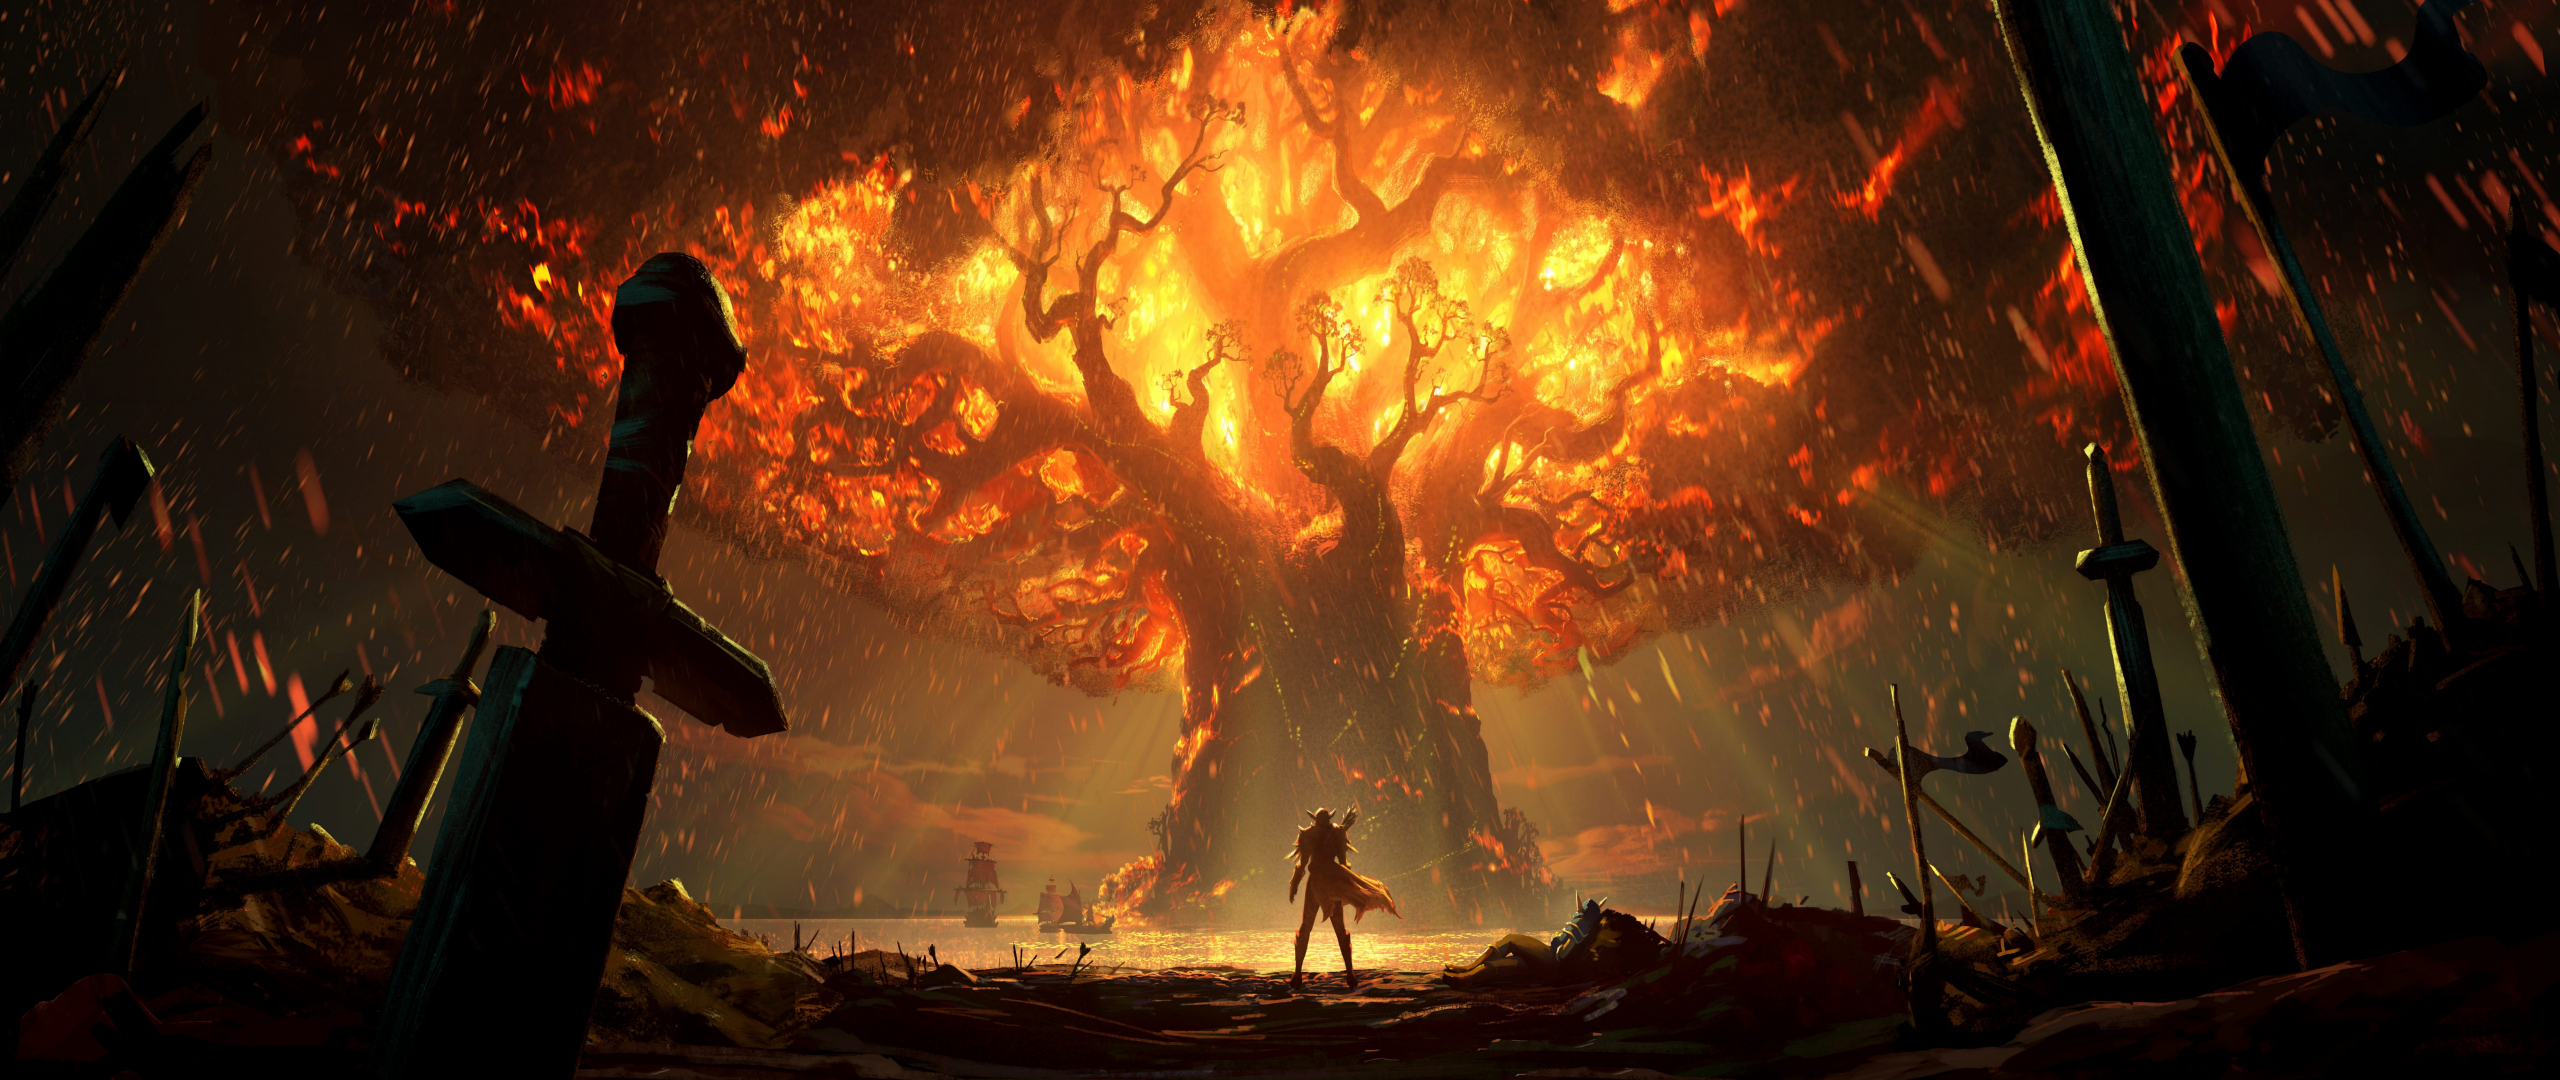 Download 2560x1080 Wallpaper World Of Warcraft Battle For